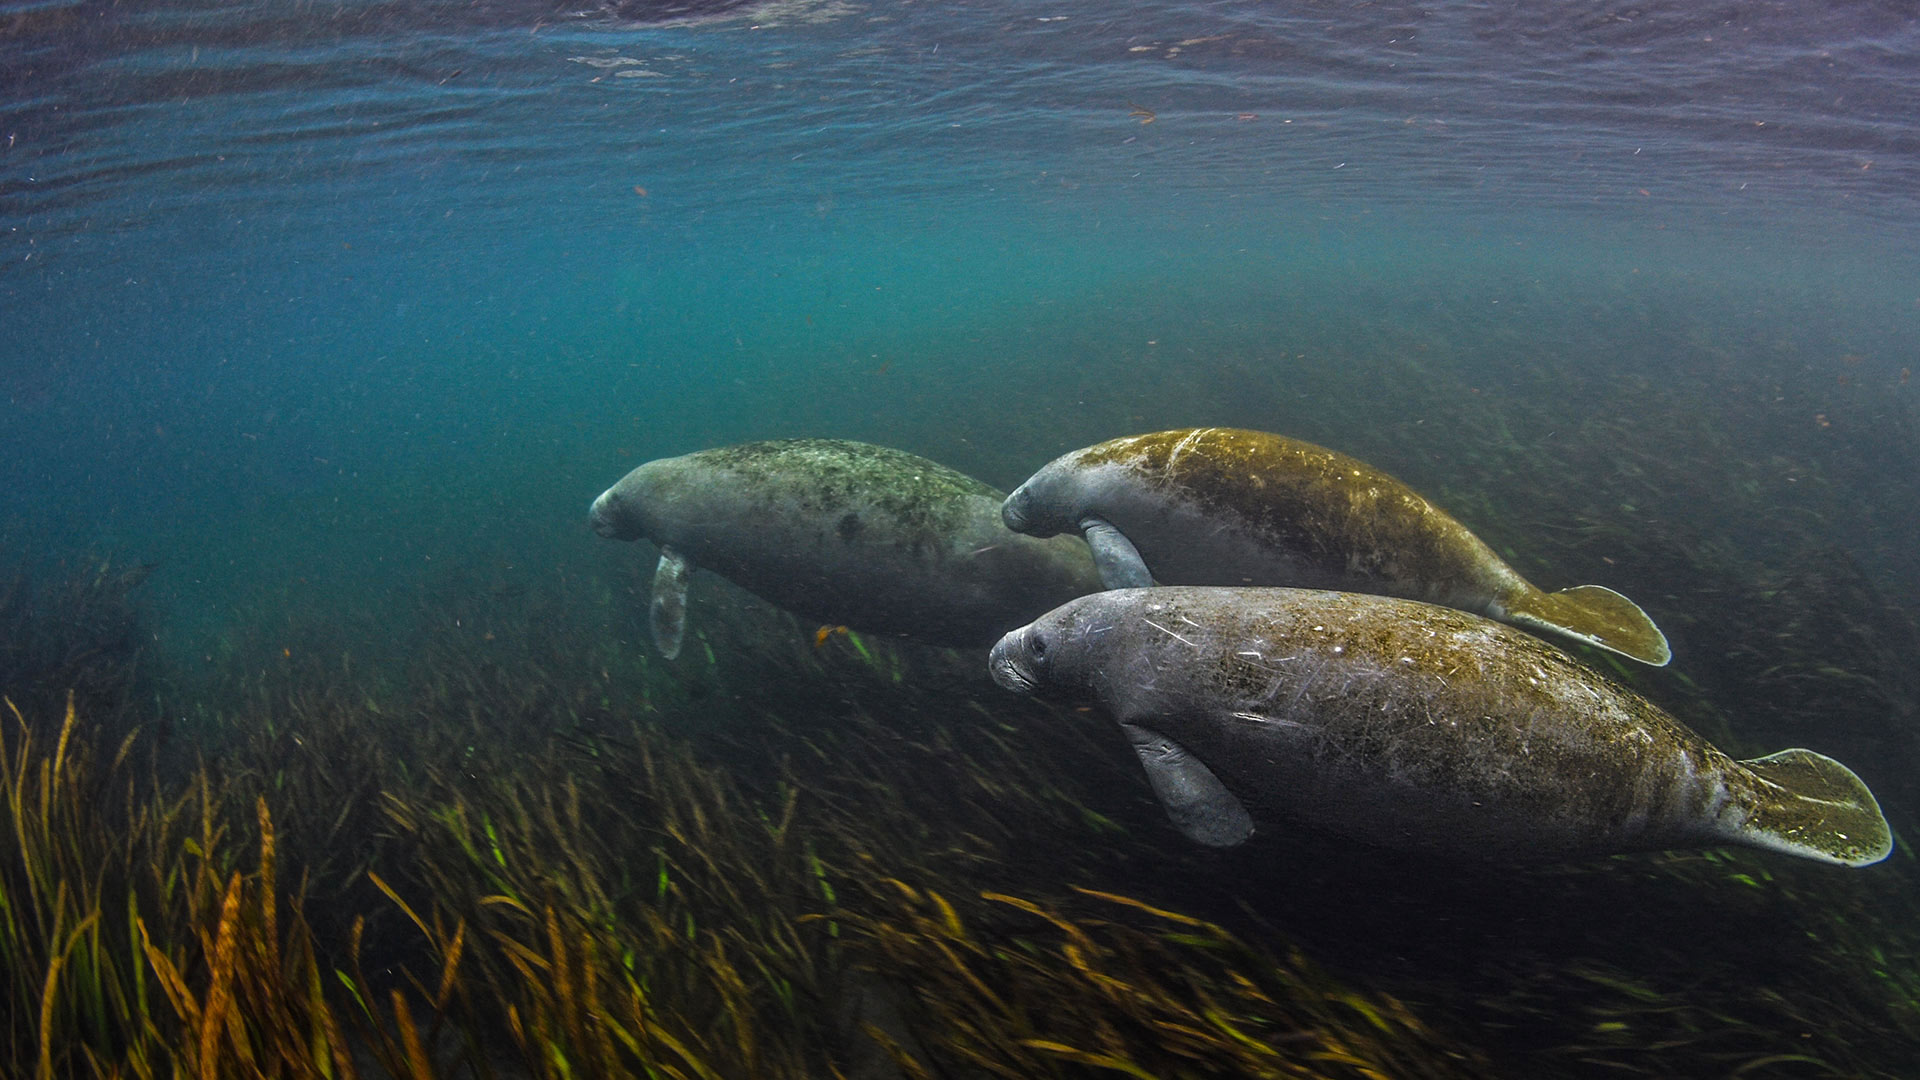 Manatees in the Ichetucknee River in Florida (© Jennifer Adler/Alamy)